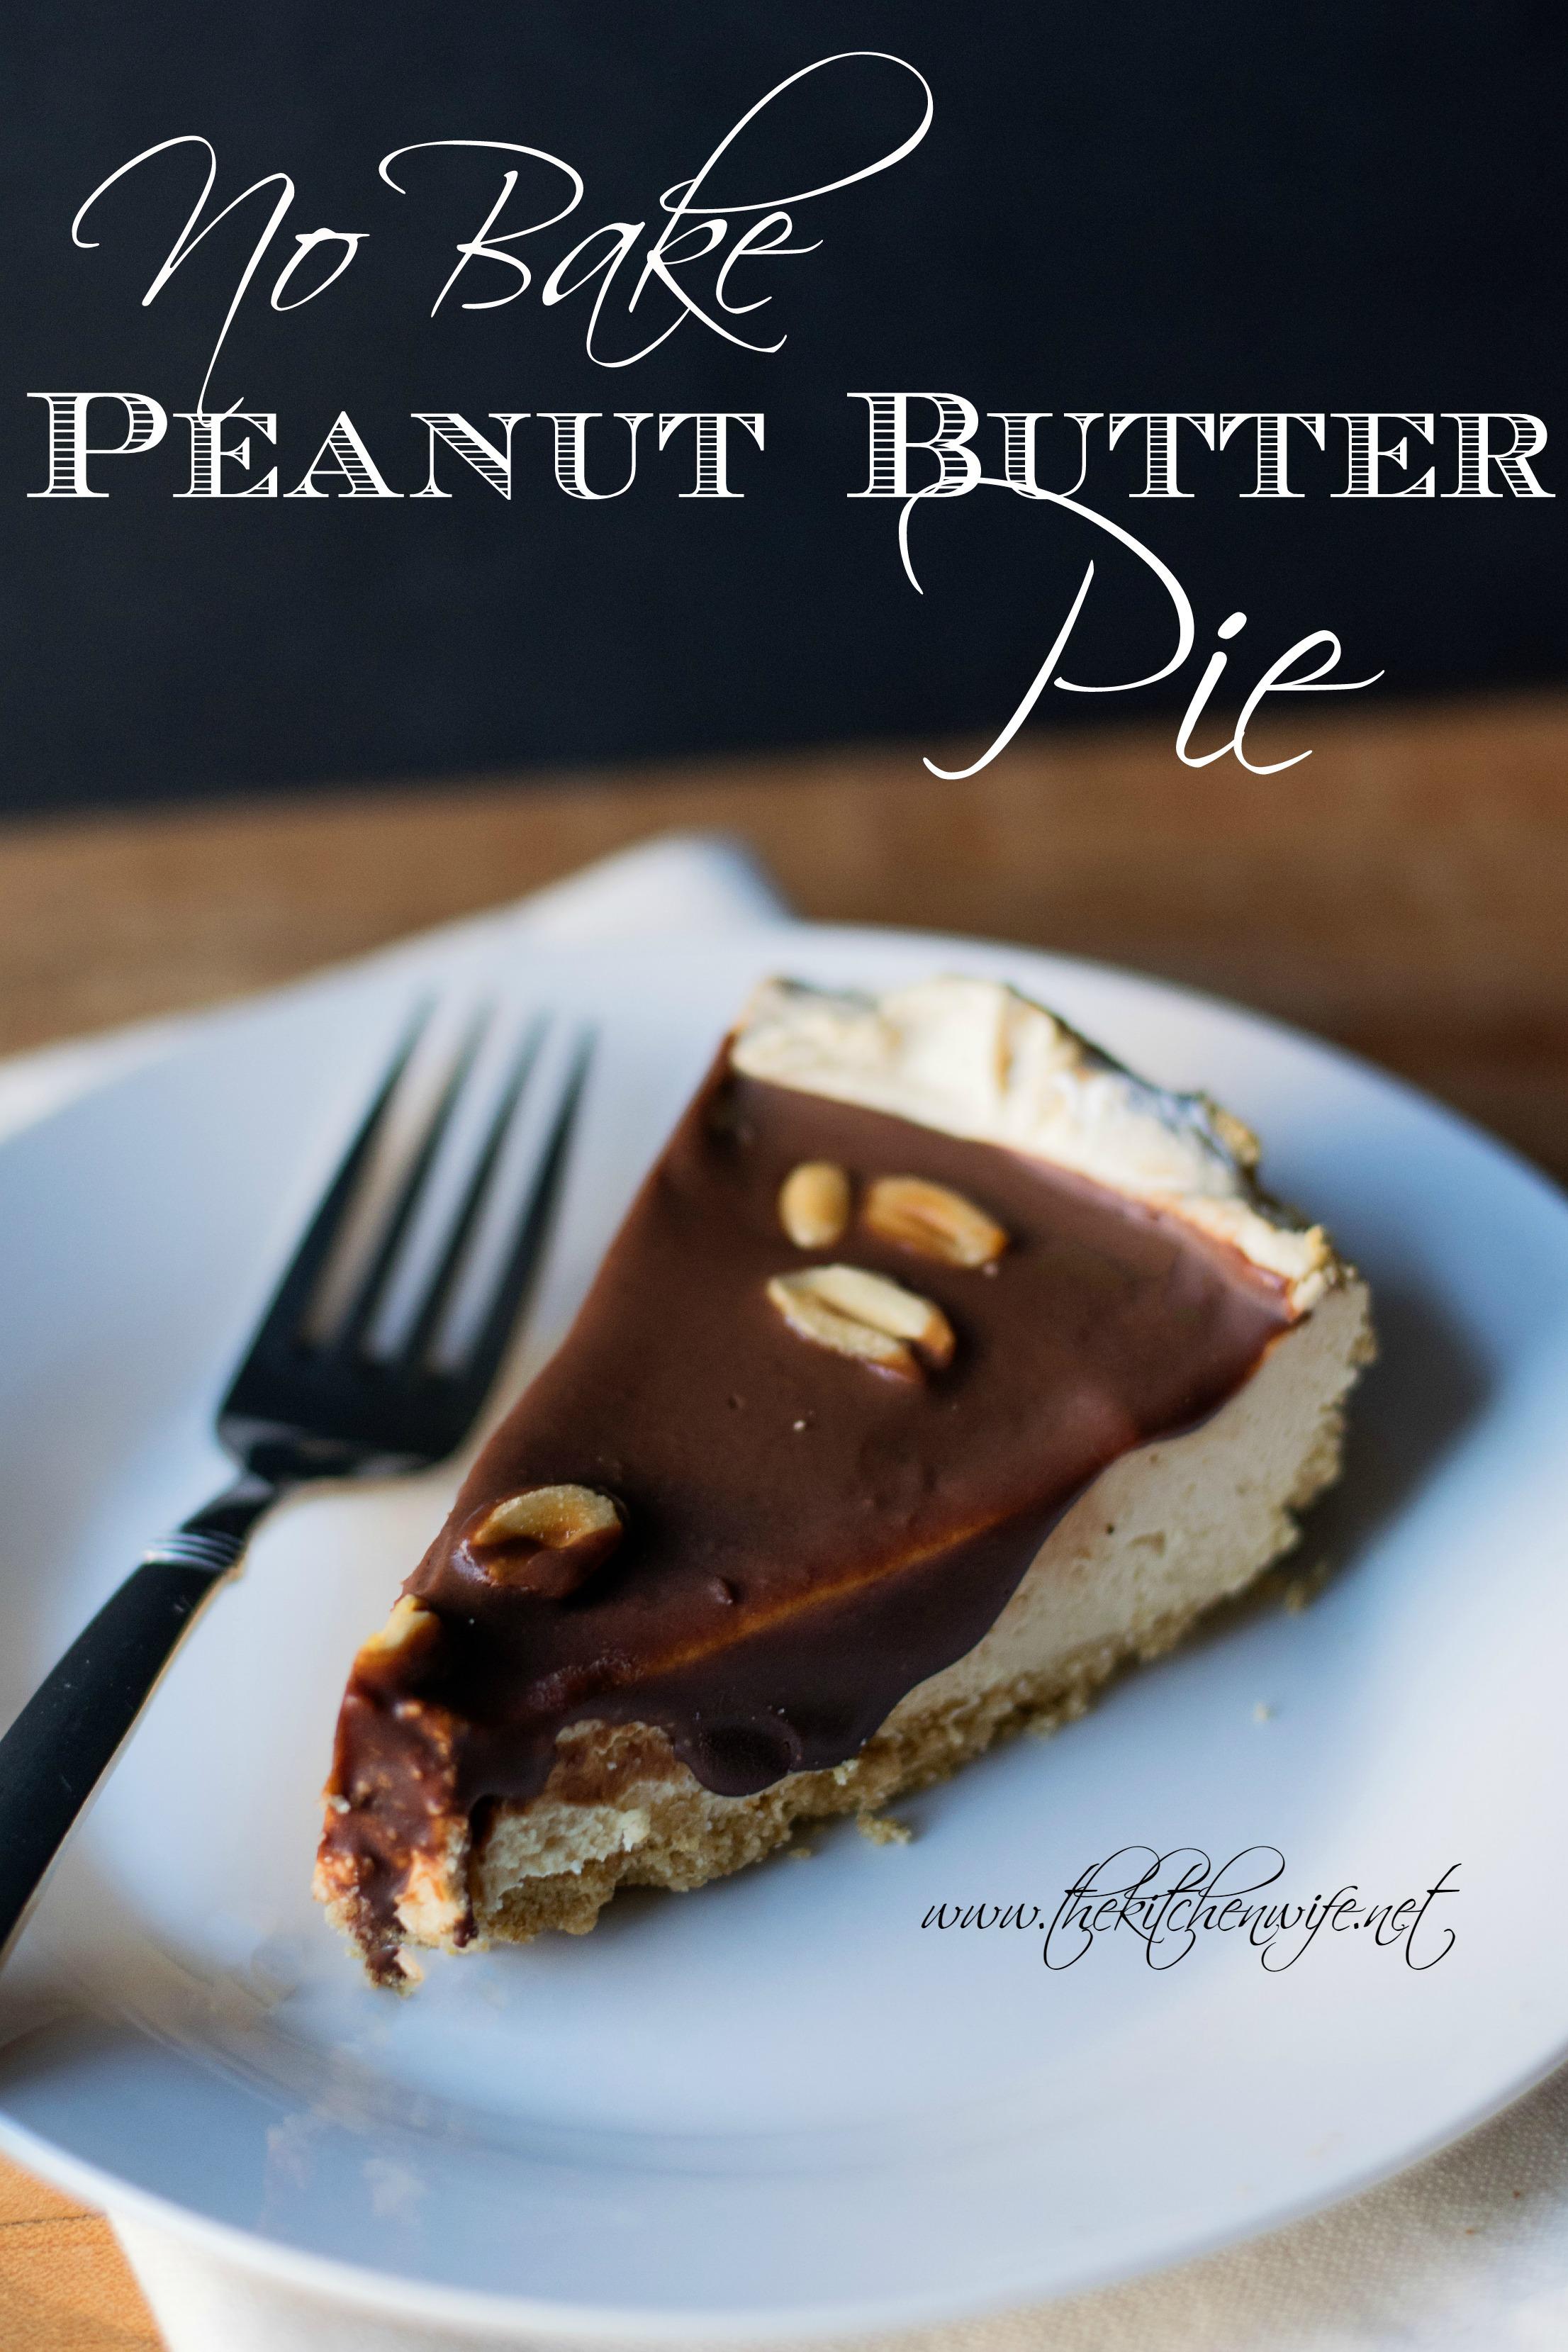 No Bake Peanut Butter Pie - TGIF - This Grandma is Fun